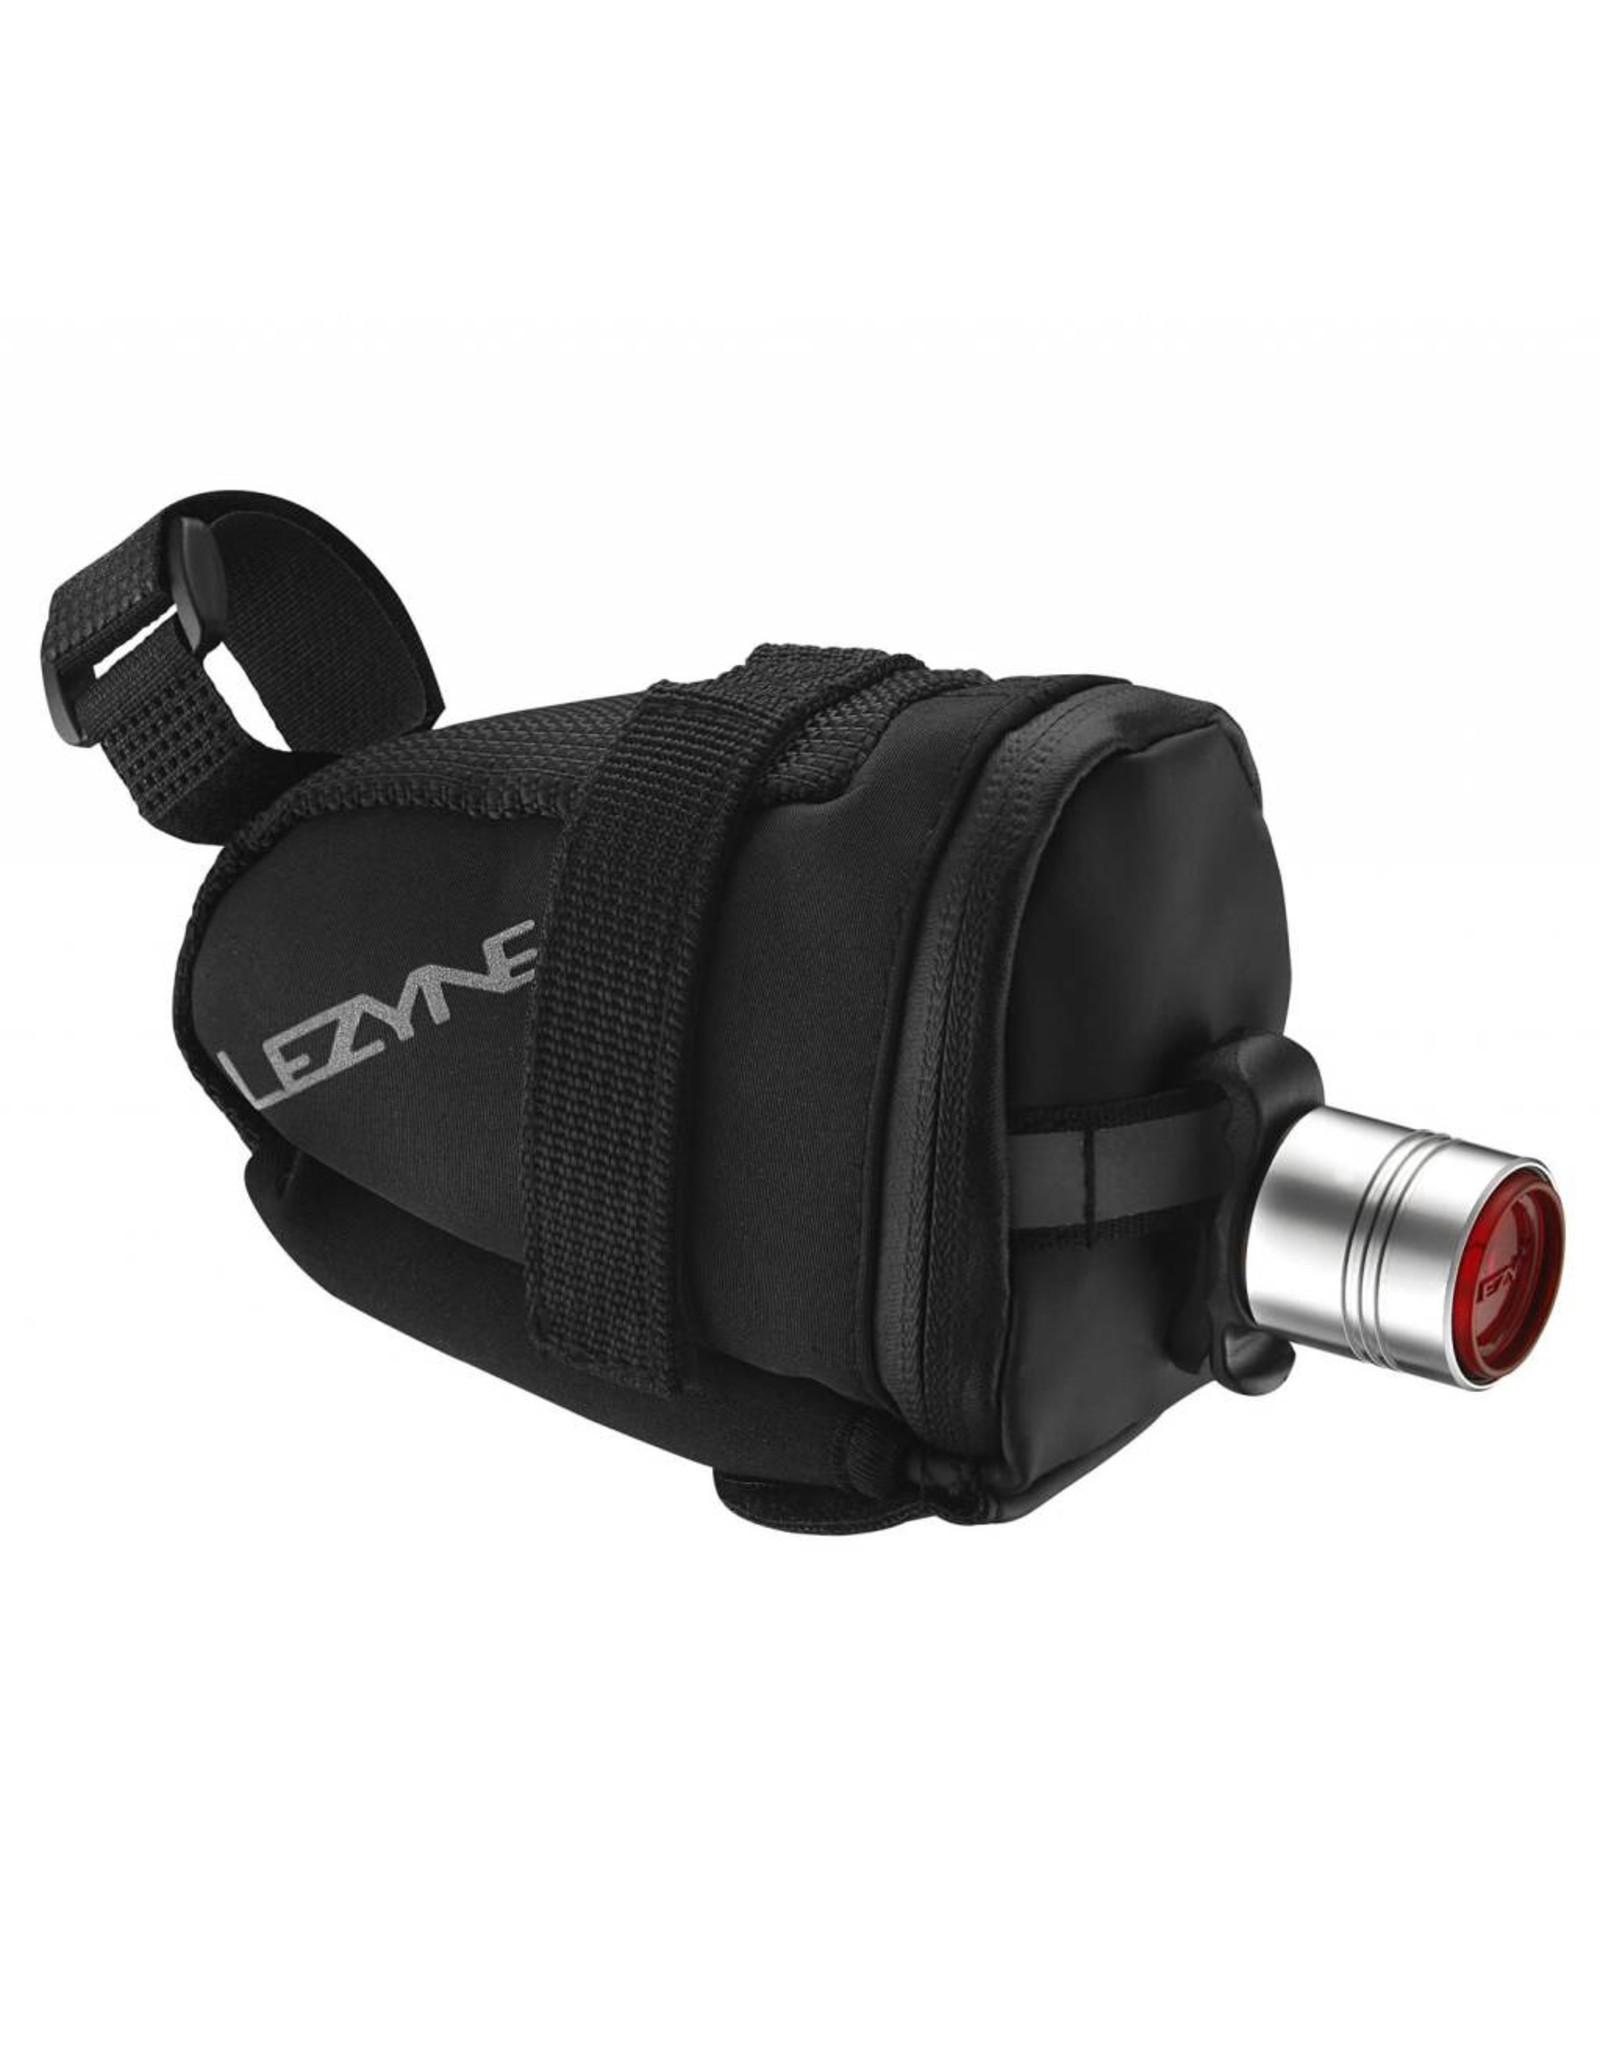 Lezyne LEZYNE Light Femto Drive LED Pair